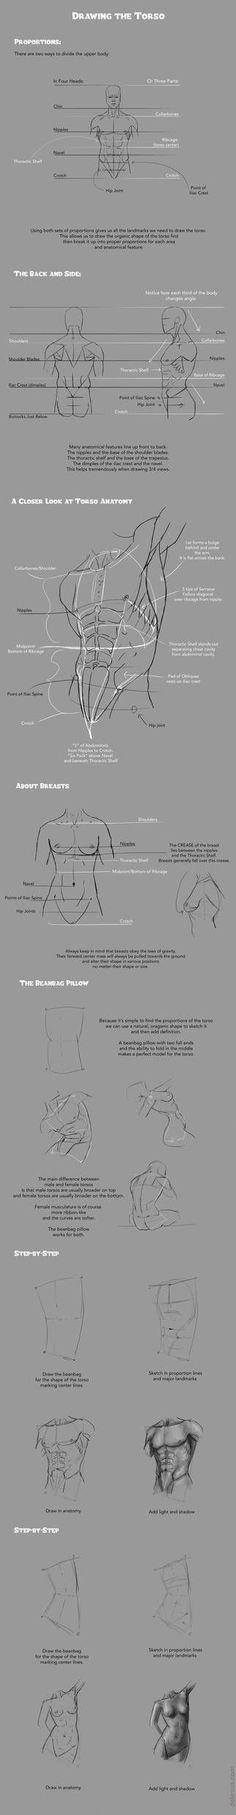 Anatomy Drawing Female Female anatomy Reference by DeviantTear on DeviantArt - Male Figure Drawing, Figure Drawing Reference, Anatomy Drawing, Anatomy Art, Human Anatomy, Human Reference, Anatomy Reference, Drawing Lessons, Drawing Tips